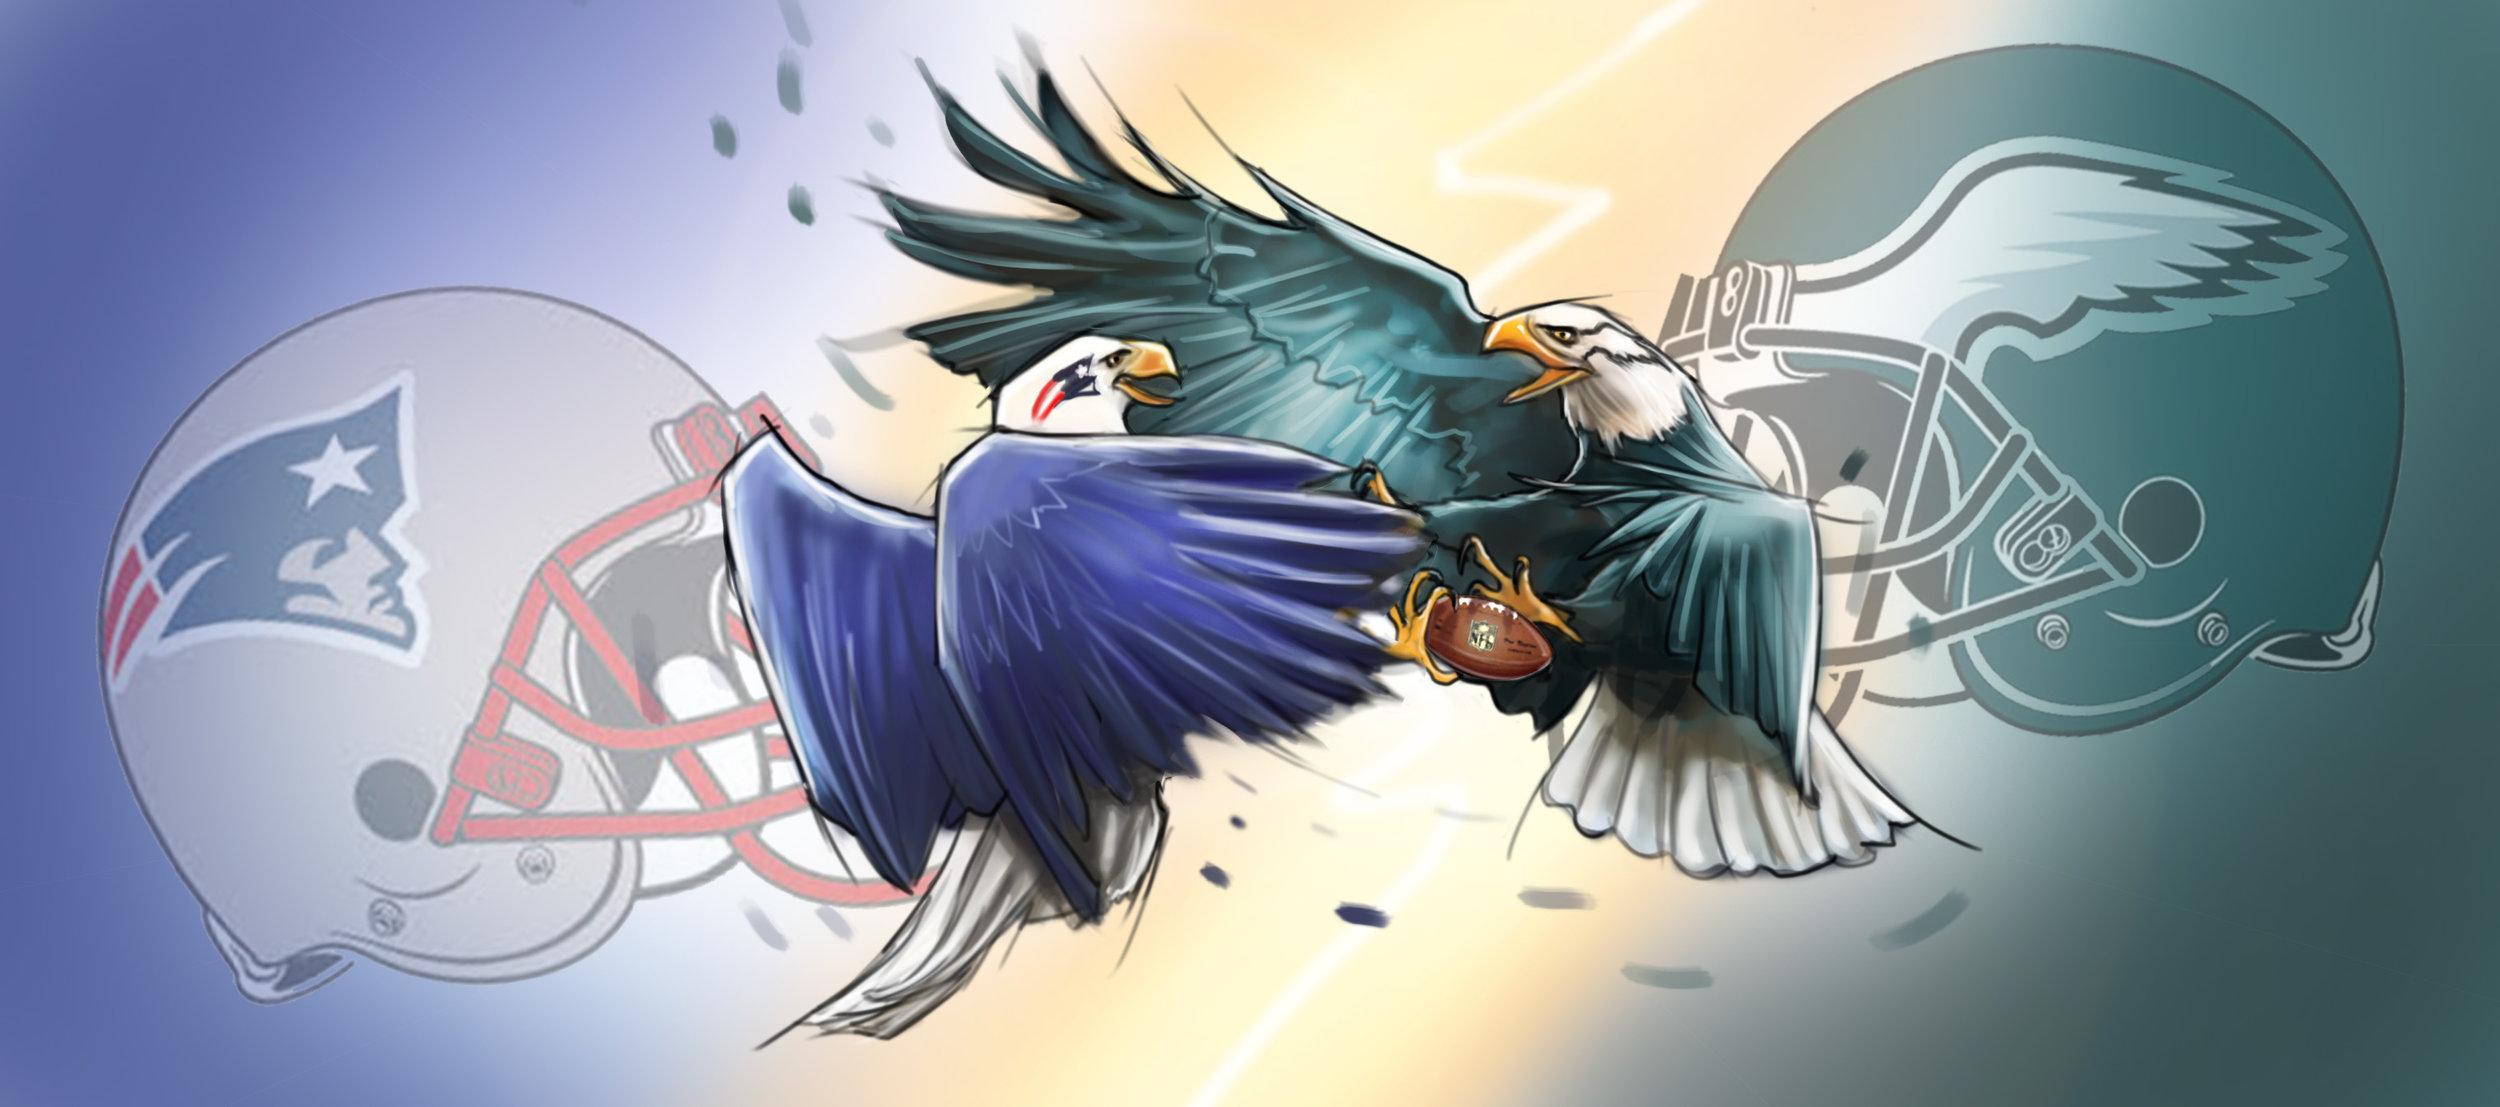 """Birds Of Prey"" Super Bowl LII"